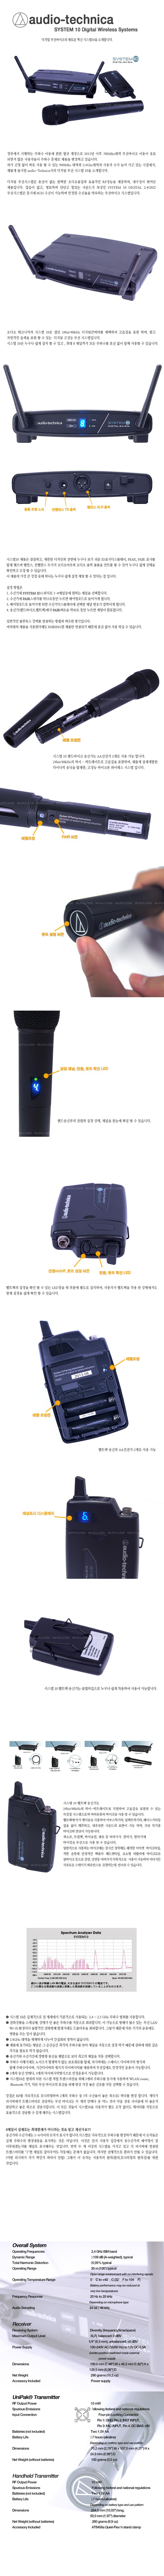 ATW-1101-info.jpg